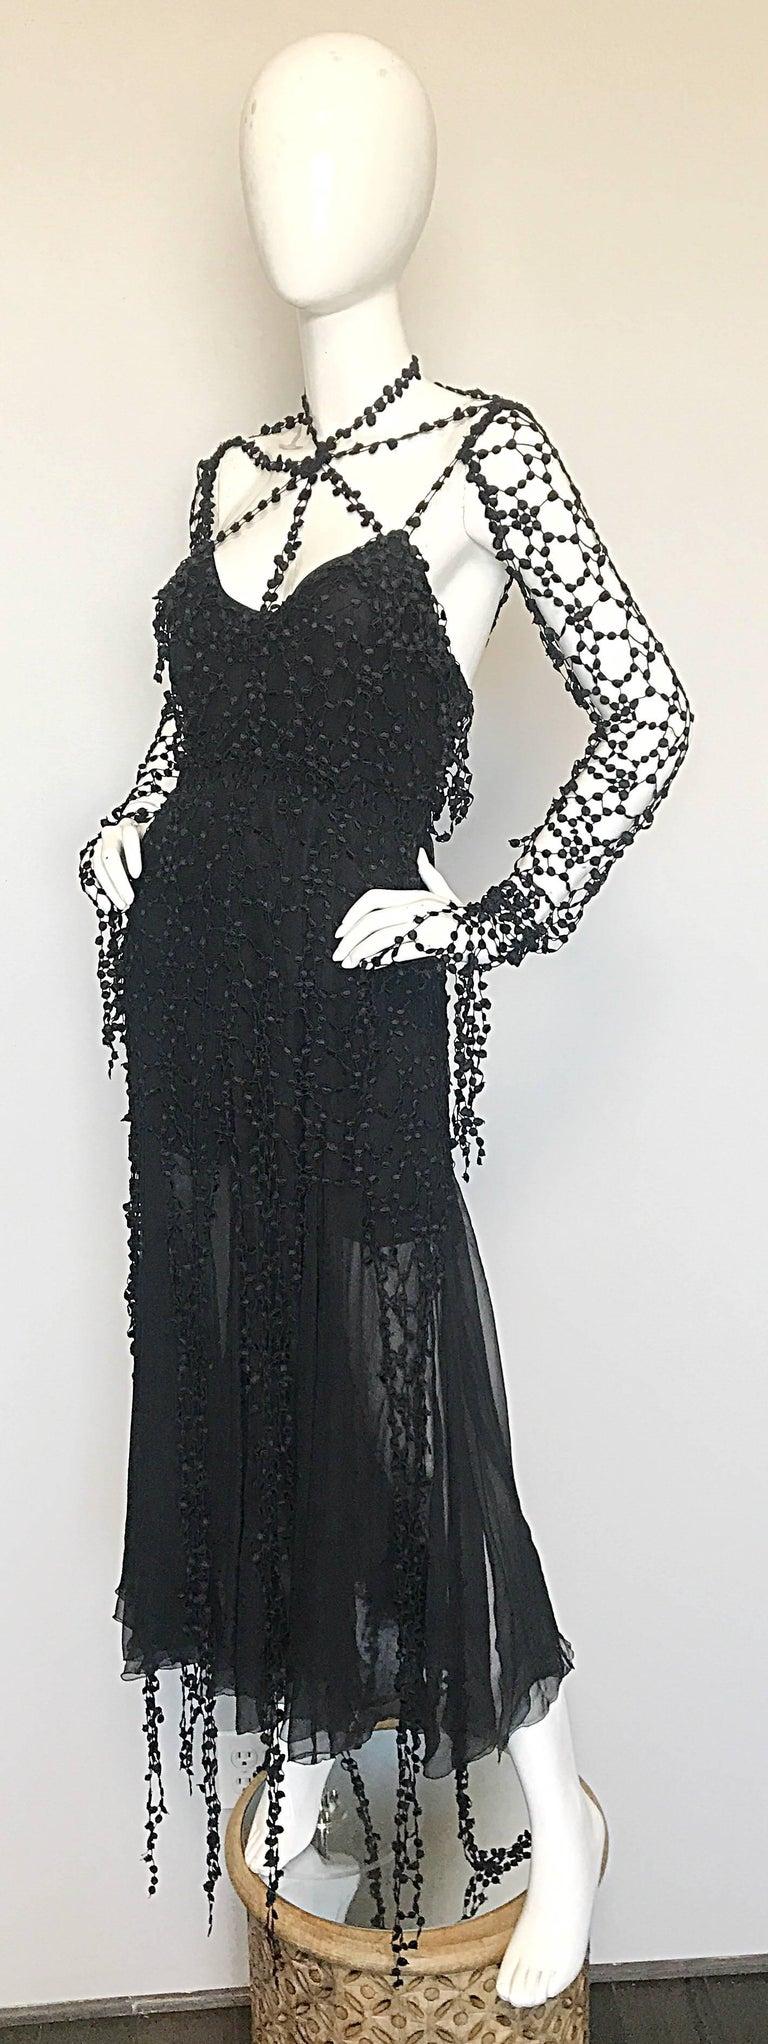 1990s Karl Lagerfeld Vintage ' Spiderweb ' Black Silk Chiffon Vintage 90s Dress 5